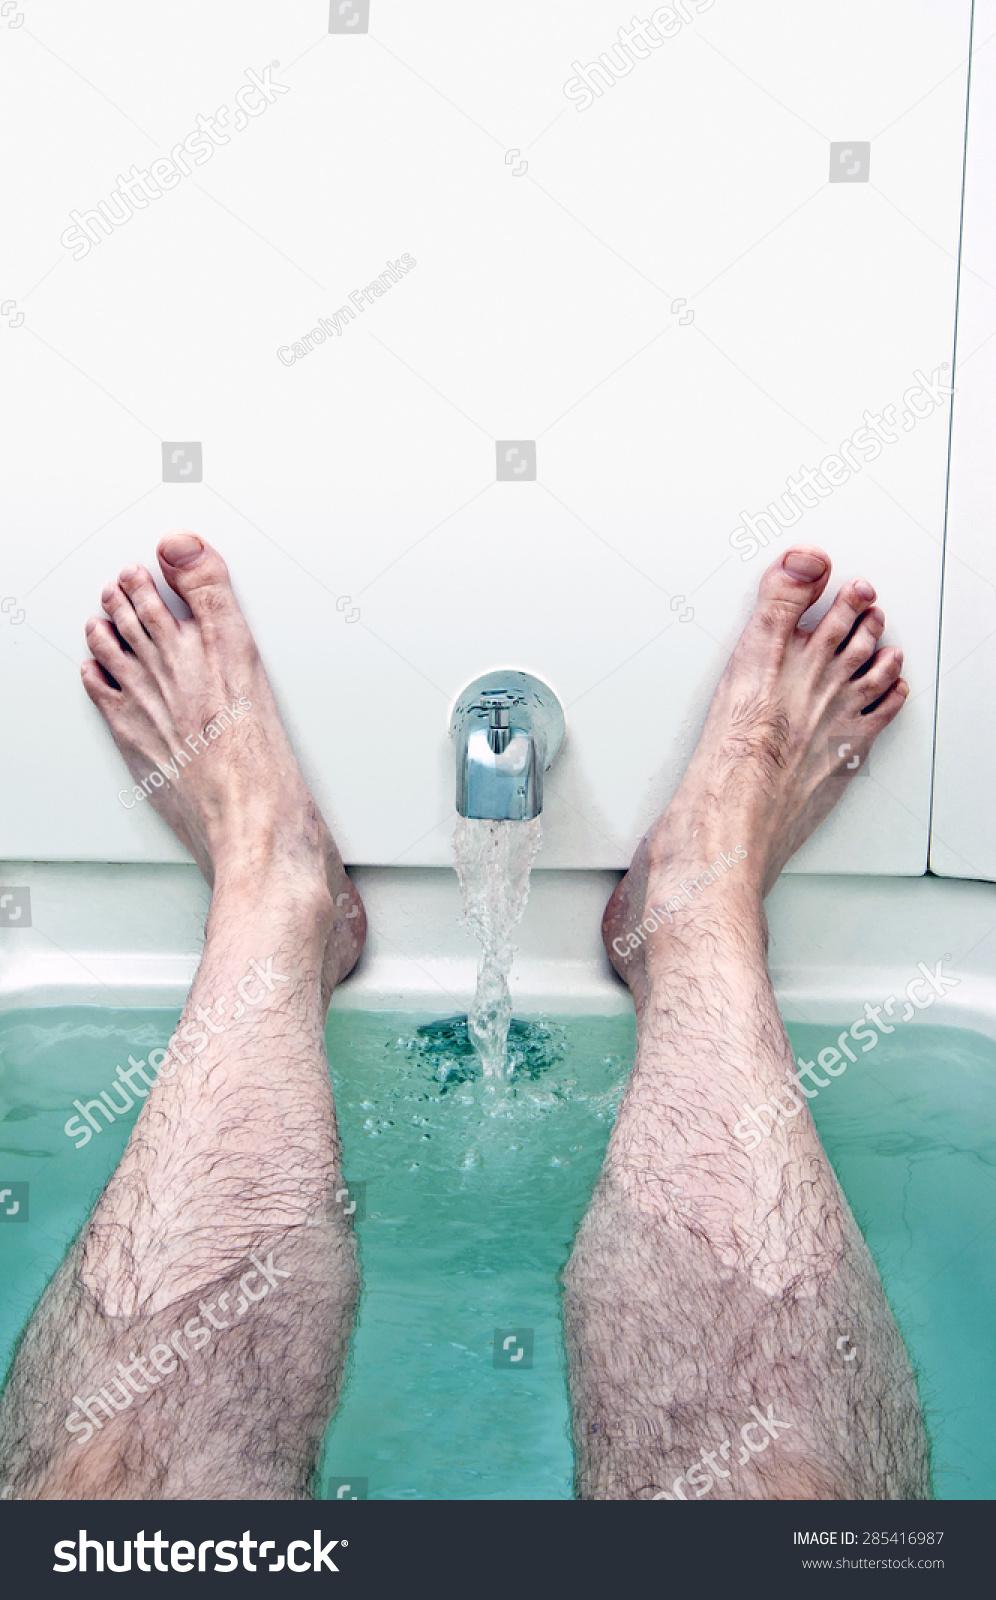 Bathtub Water Running Between Mans Feet Stock Photo (Royalty Free ...